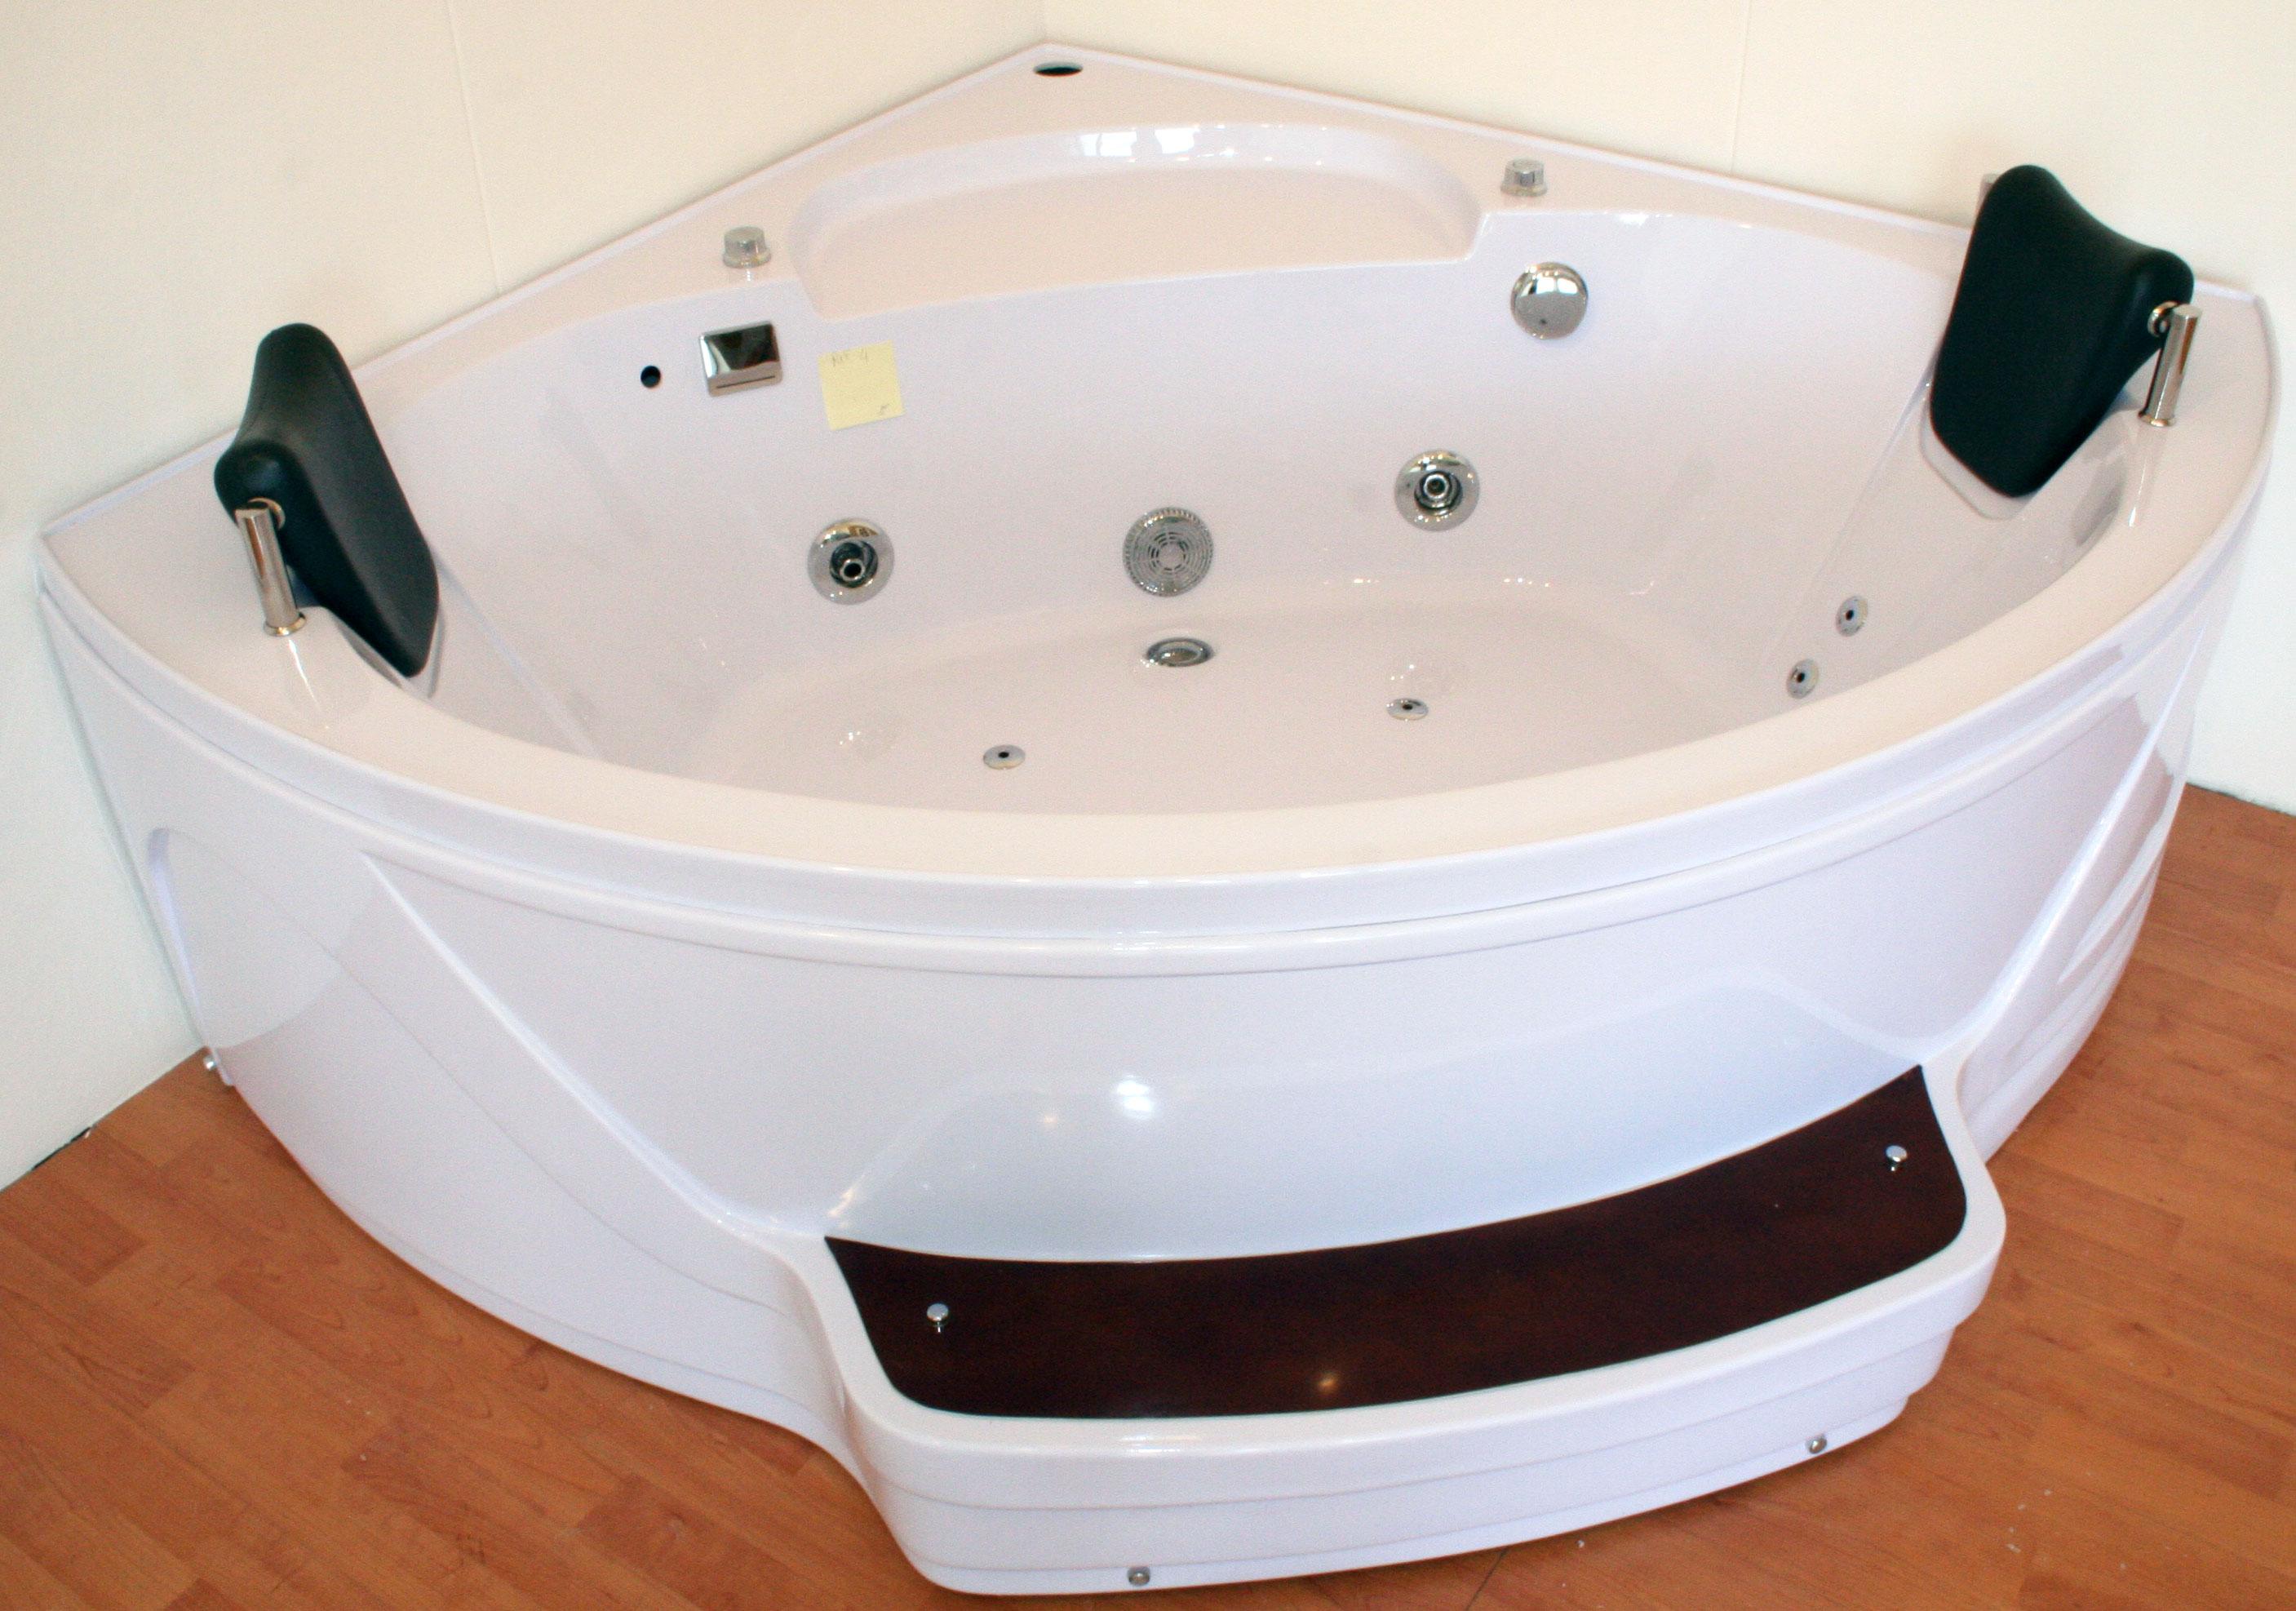 Copri Vasca Da Bagno Angolare : Rif 4. vasca da bagno 145x145 idromassaggio angolare blog box doccia